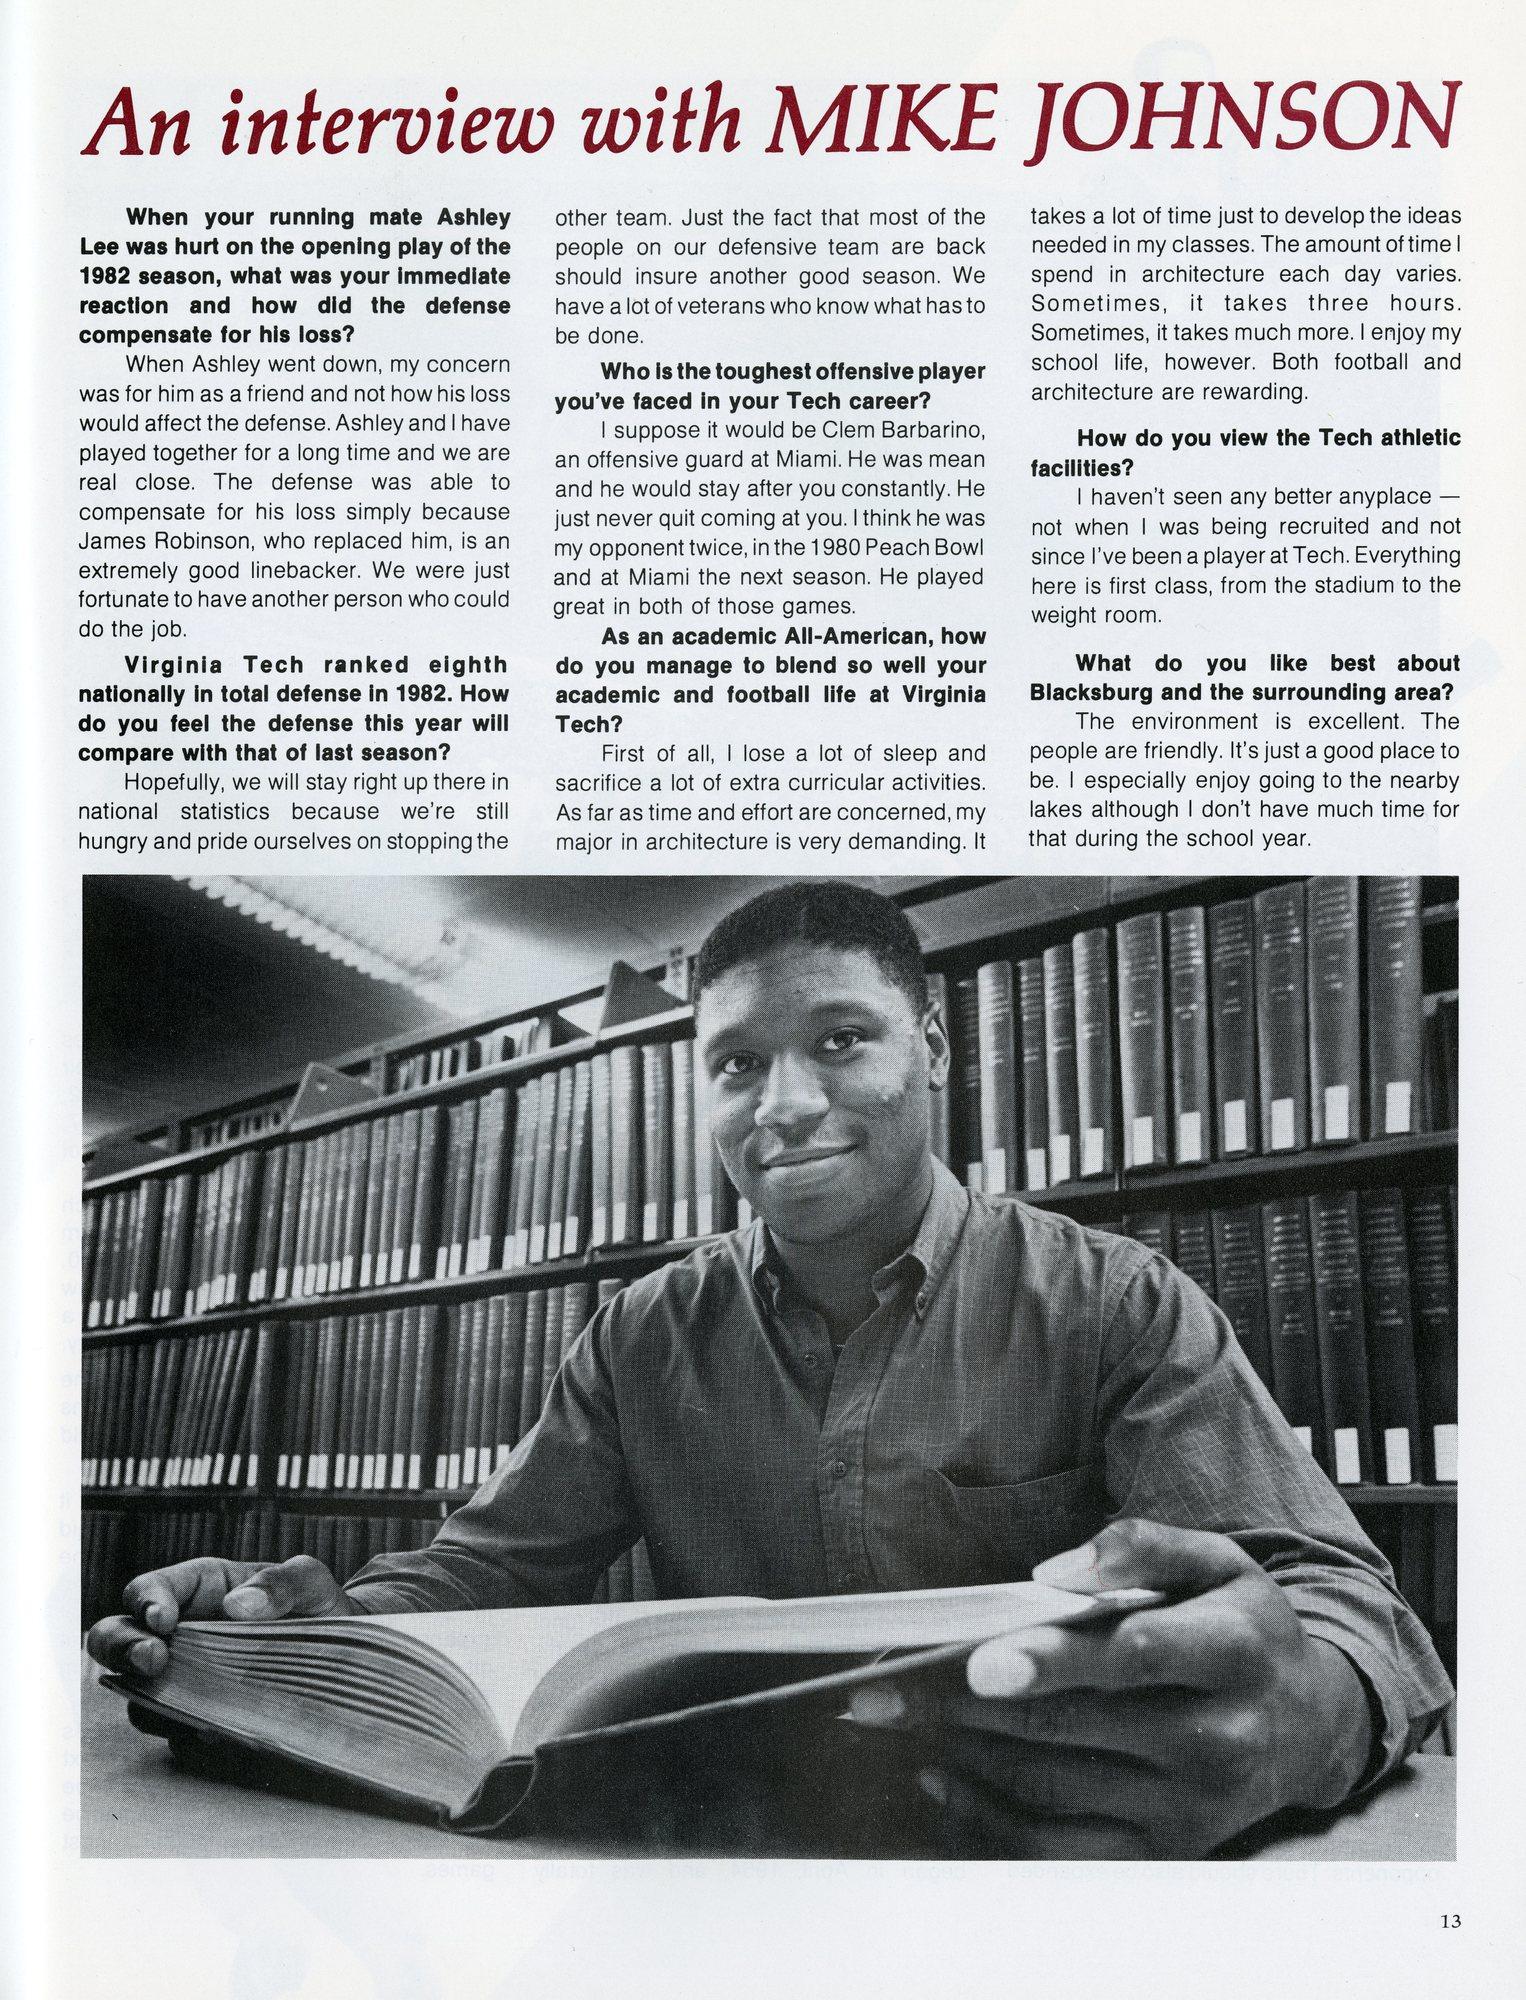 http://spec.lib.vt.edu/pickup/Omeka_upload/JohnsonMike_MaroonBook_1983.jpg